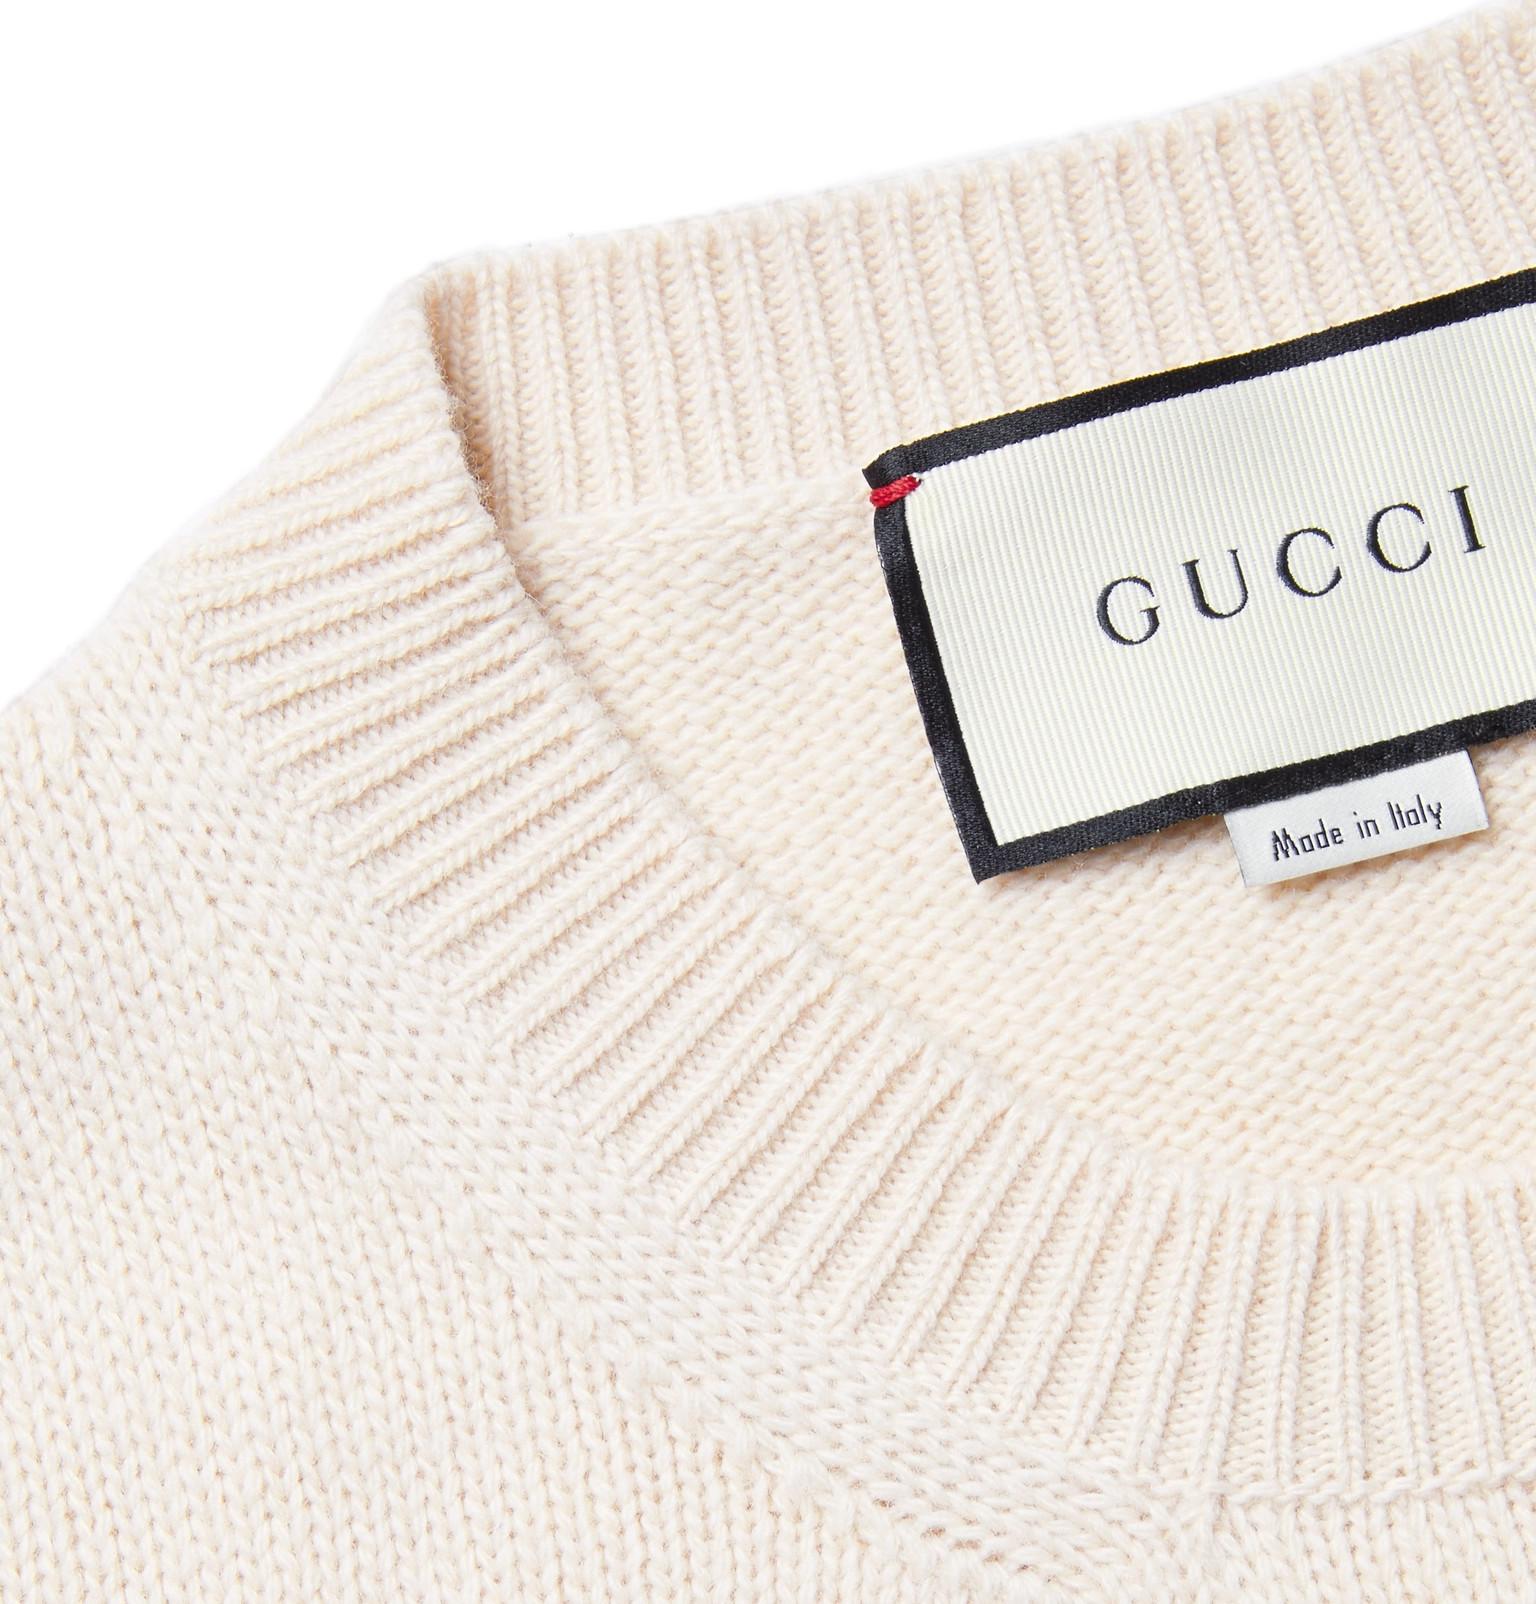 57909e39c0ff3 Gucci - Shark-Intarsia Wool Sweater